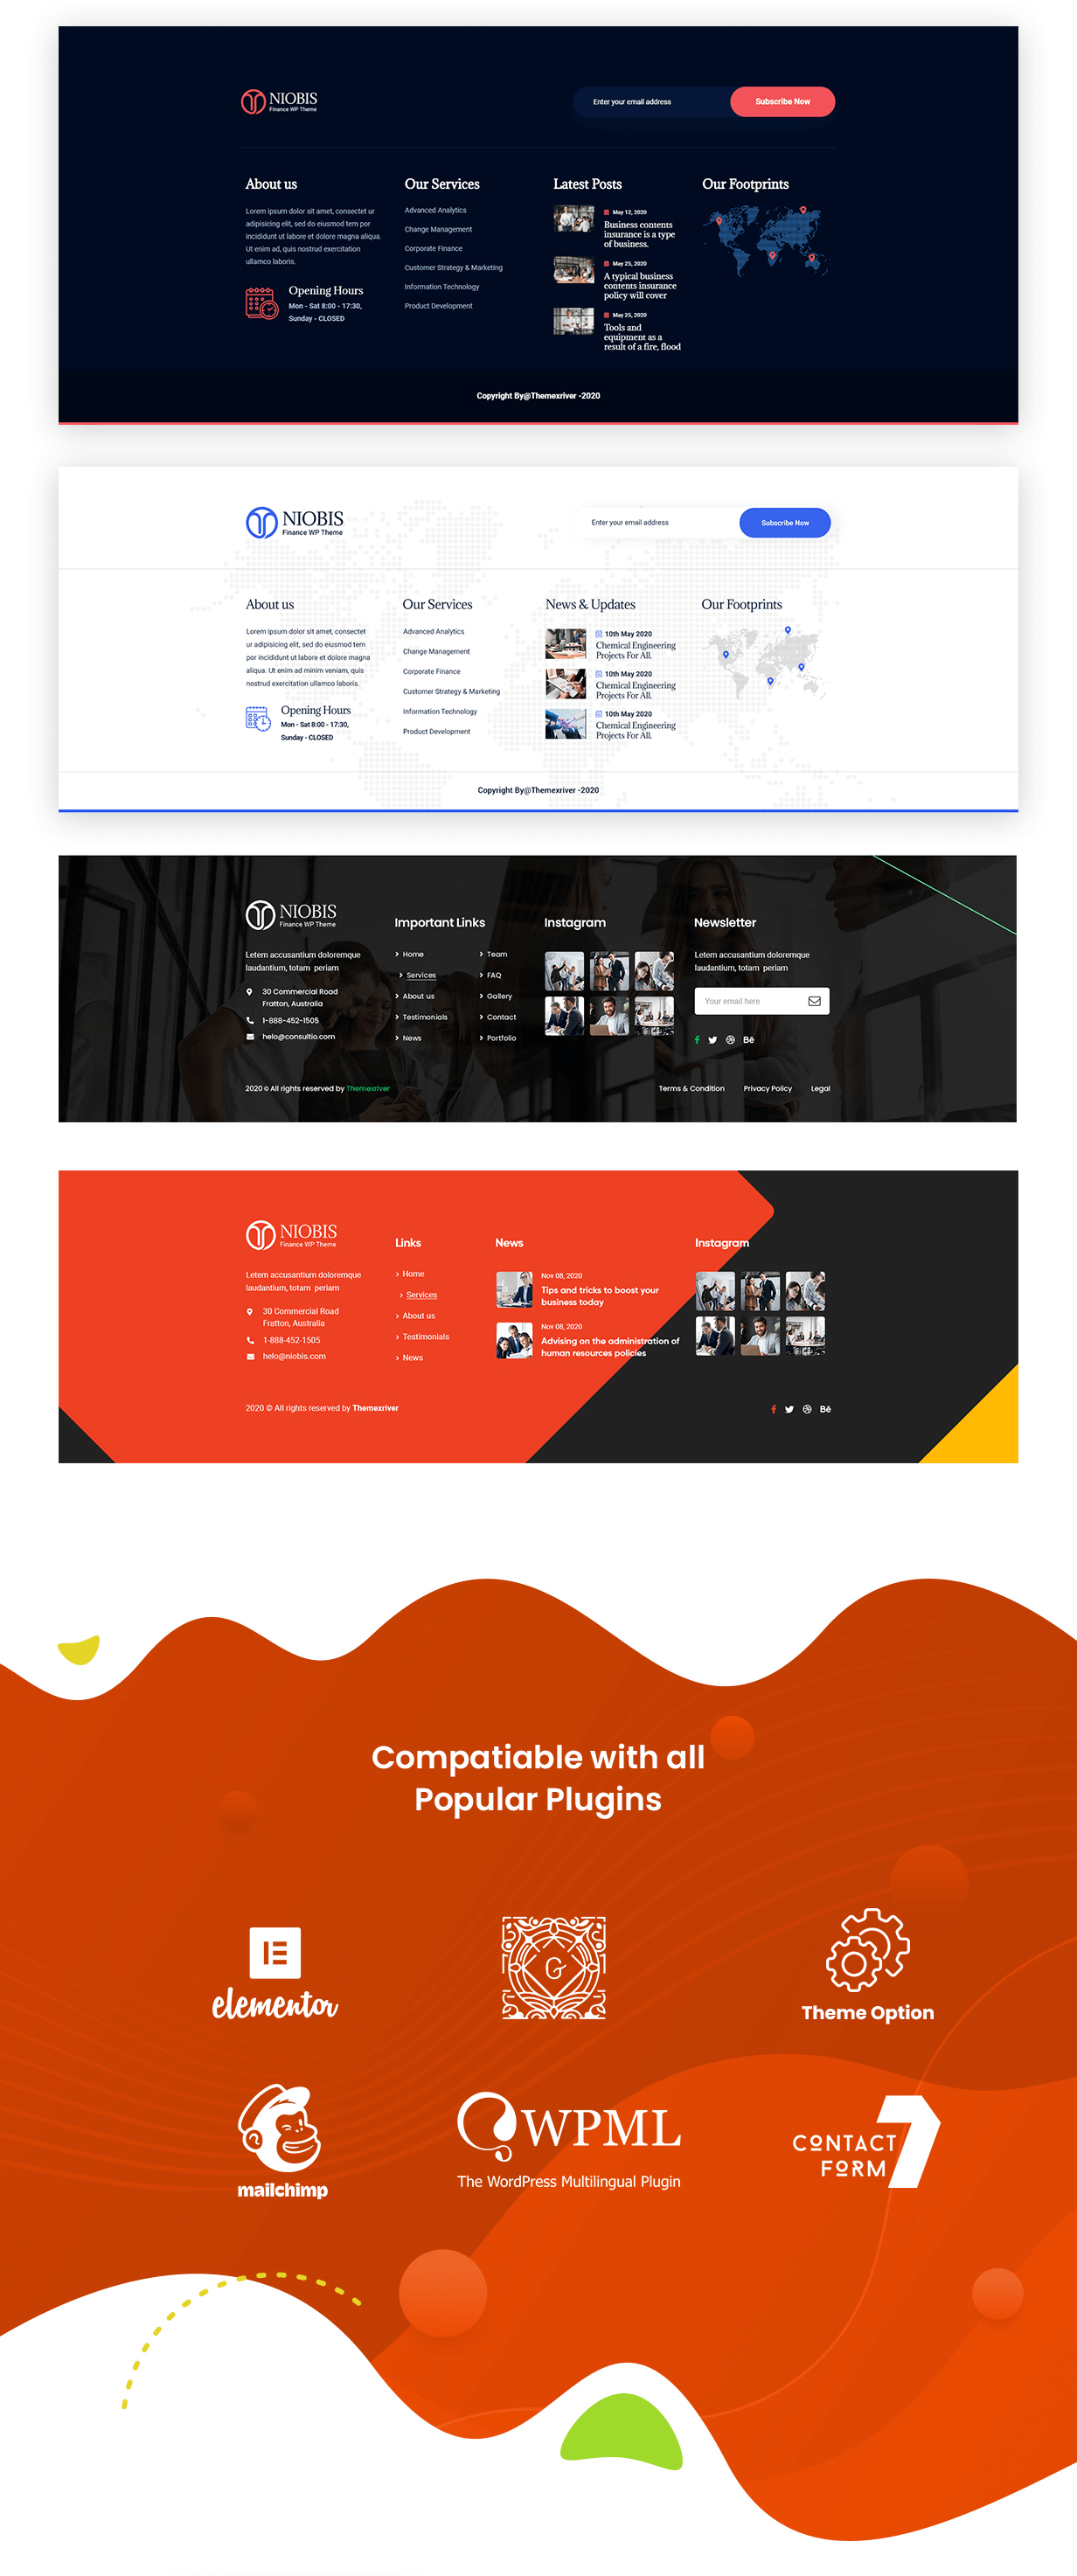 NioBis - Business Consulting WordPress - 6